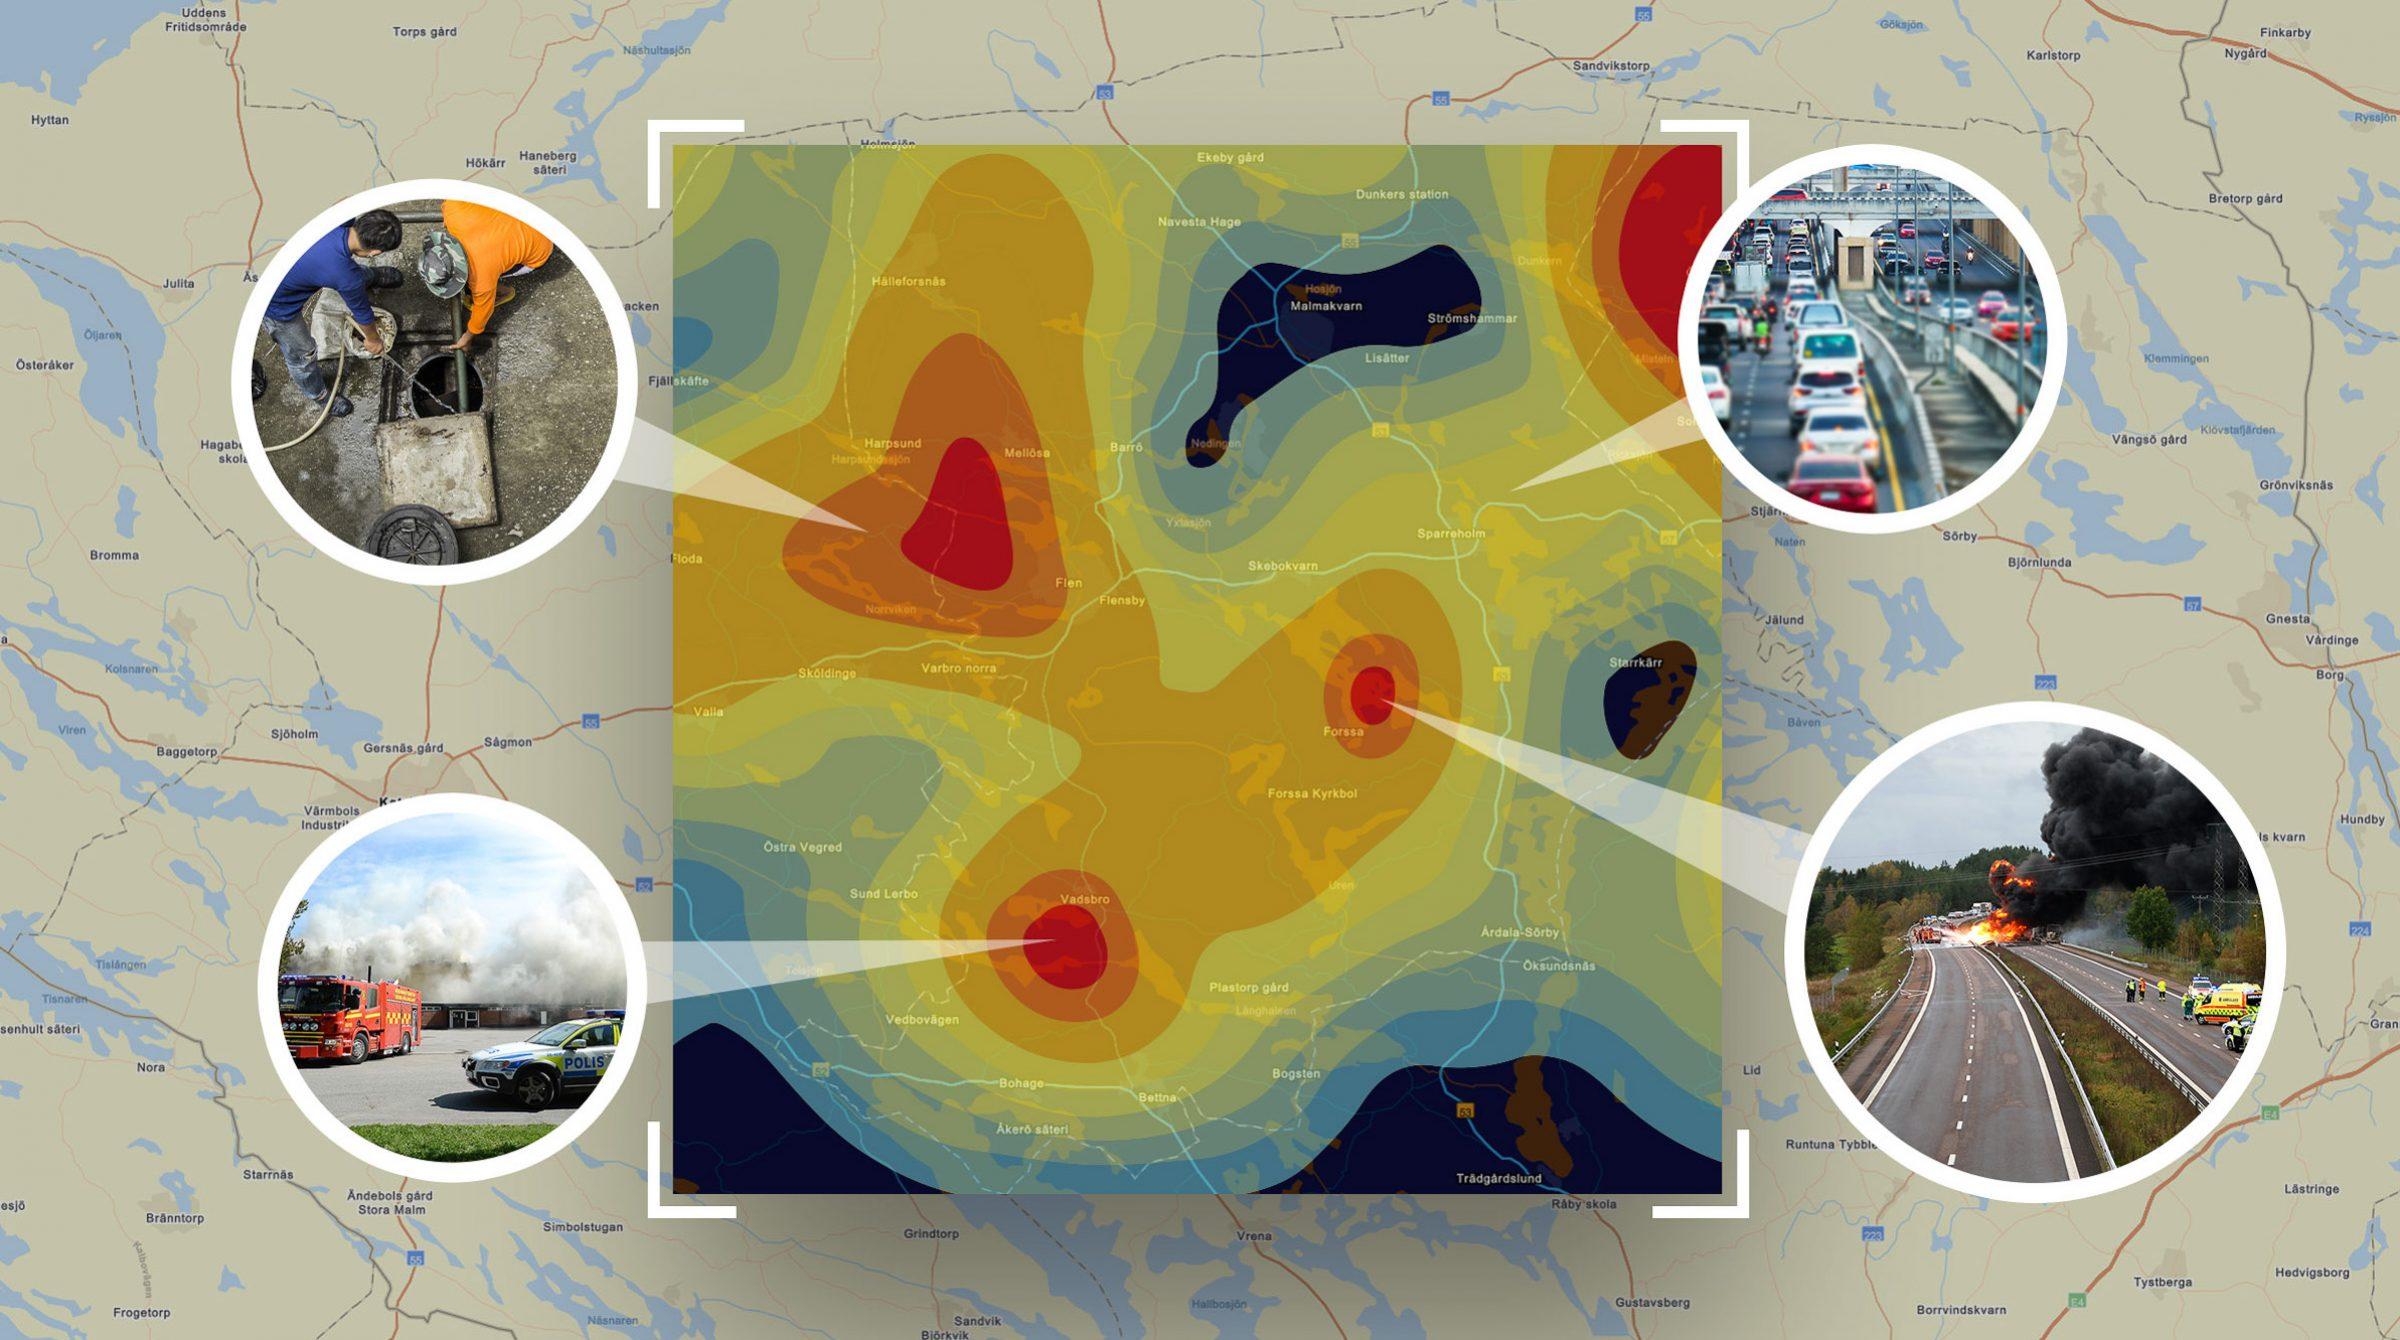 En karta i ArcGIS kan visar vad som sker var